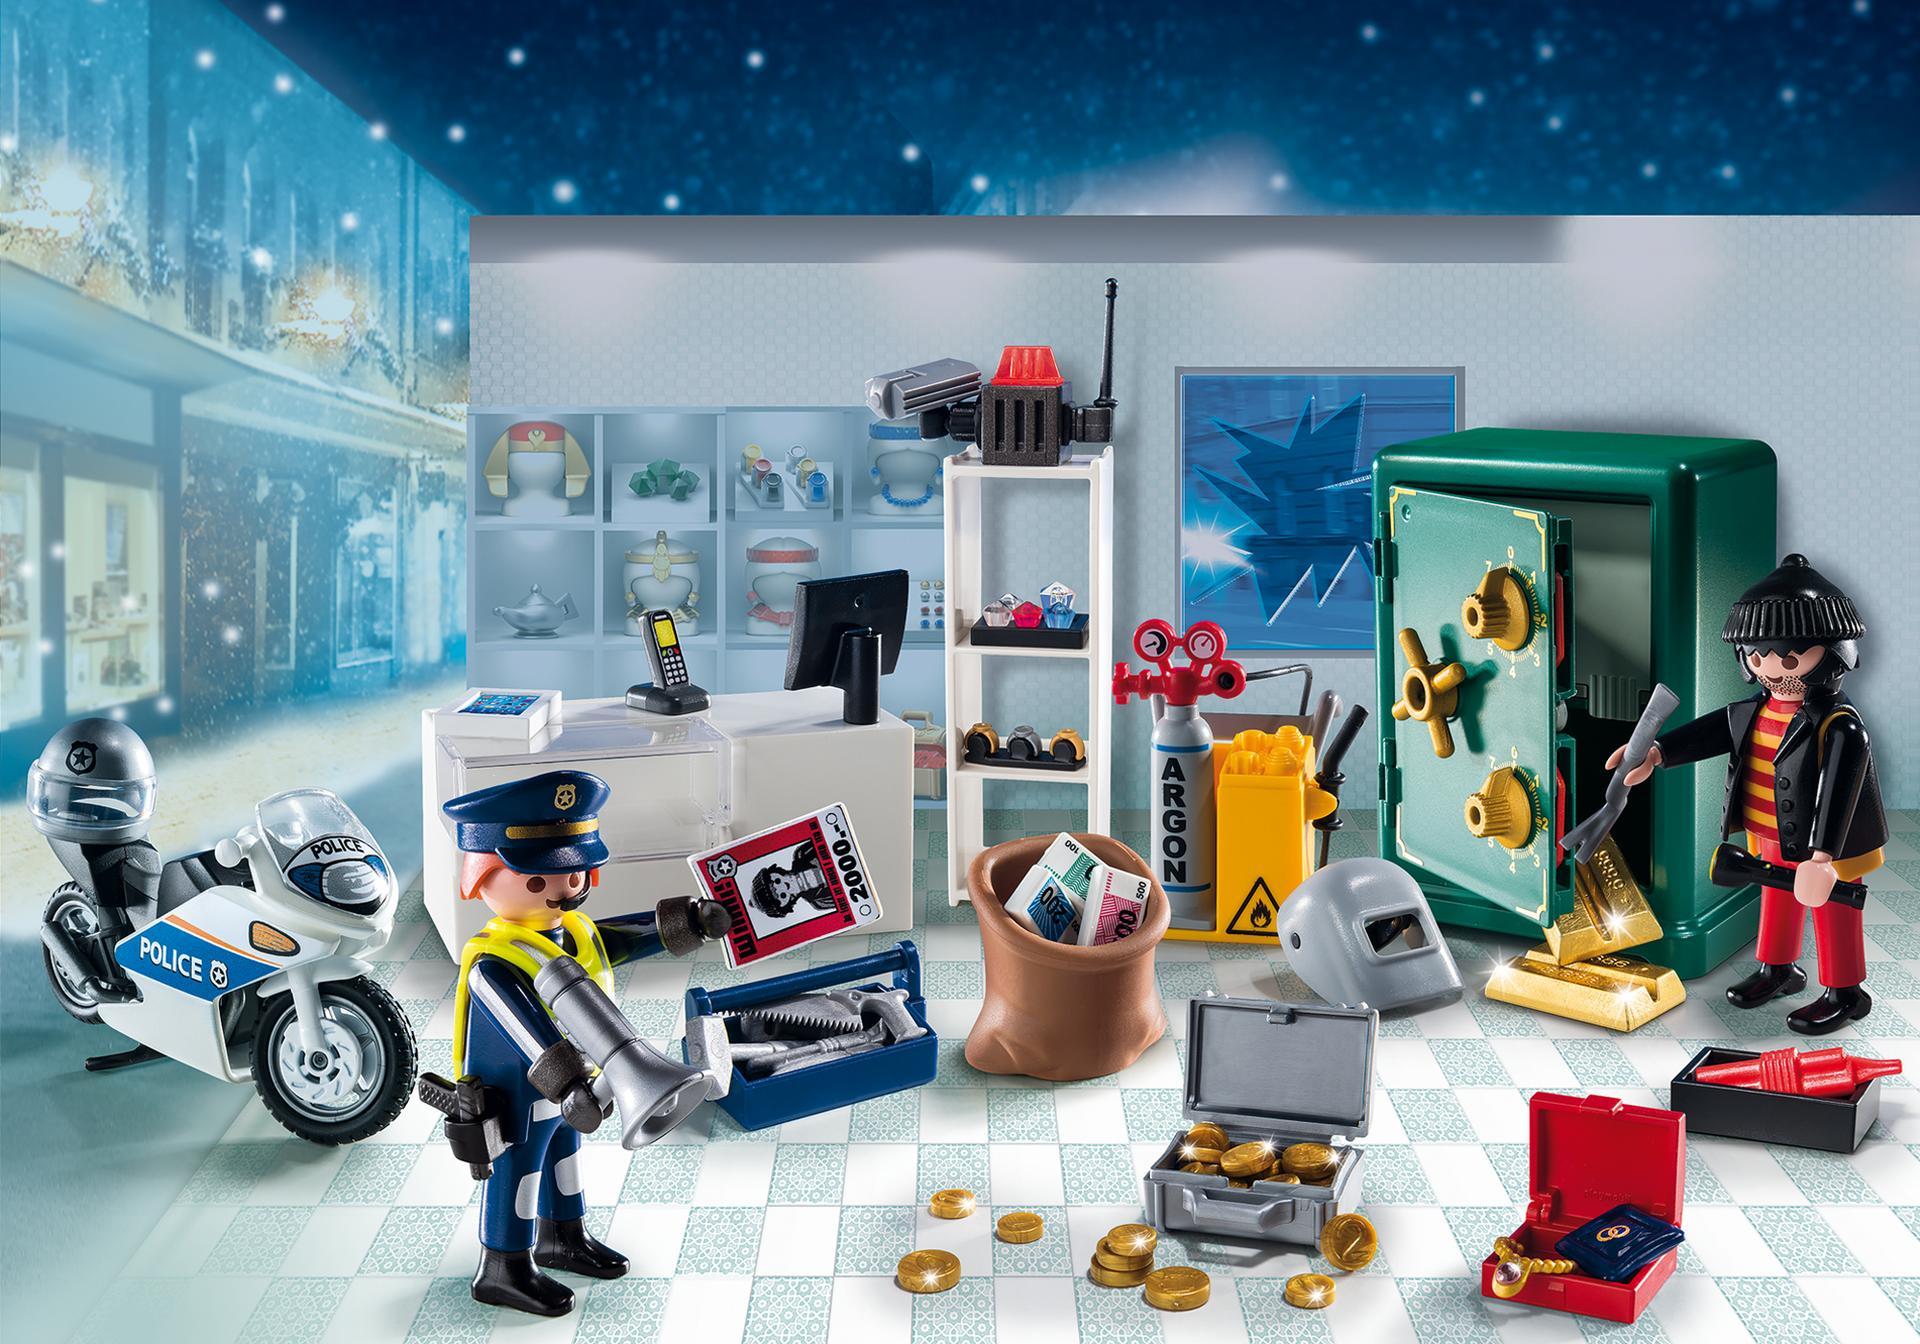 adventskalender op heterdaad betrapt 39 39 9007 playmobil nederland. Black Bedroom Furniture Sets. Home Design Ideas